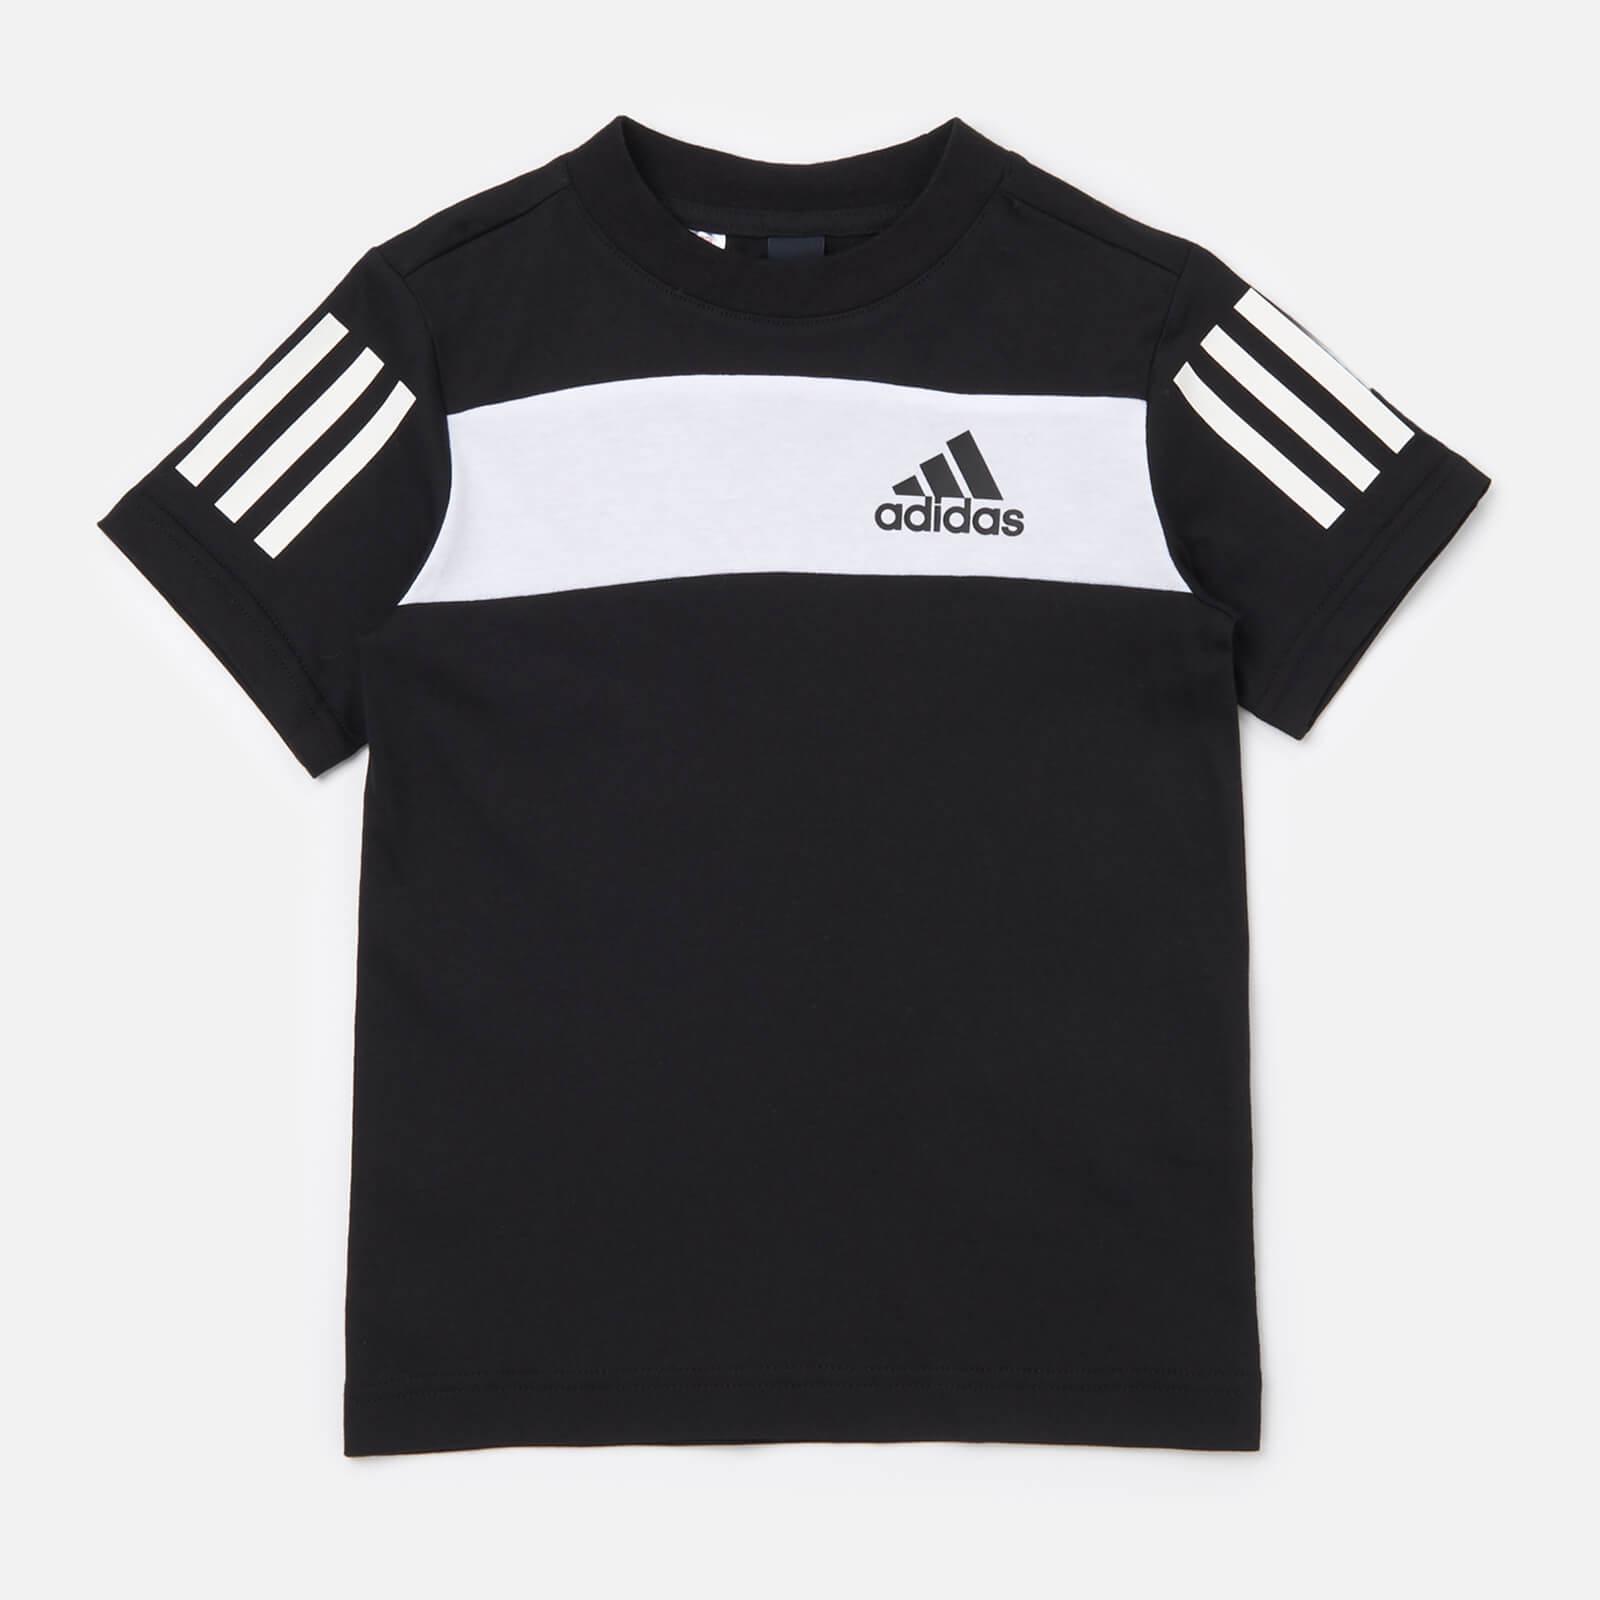 adidas Boys' Young Boys Sid T-Shirt - Black - 4-5 years